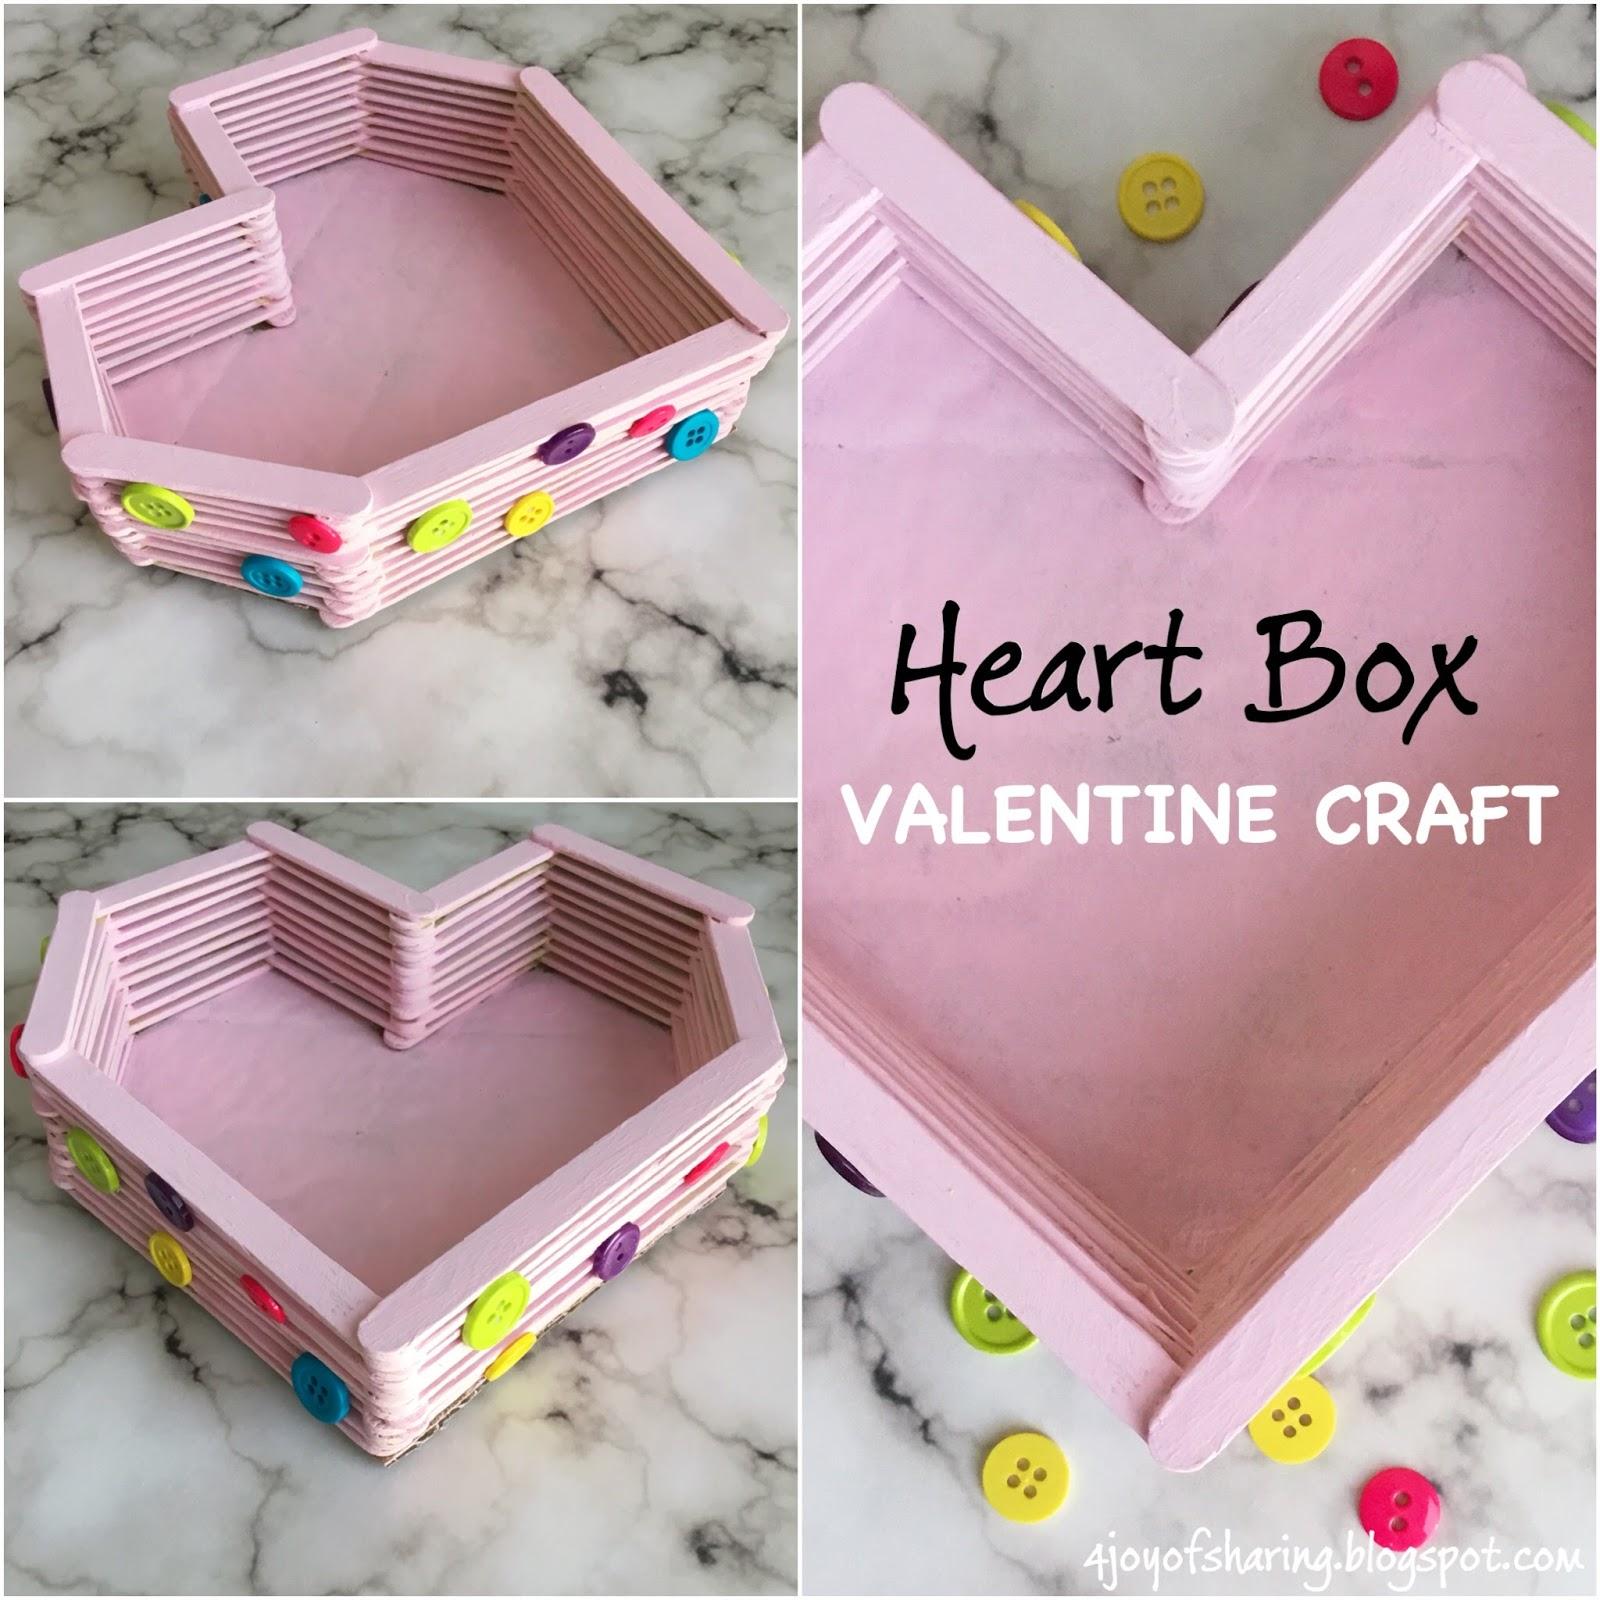 The joy of sharing diy heart box valentine craft valentines day craft valentines craft card ideas simple craft idea 10 mins jeuxipadfo Gallery